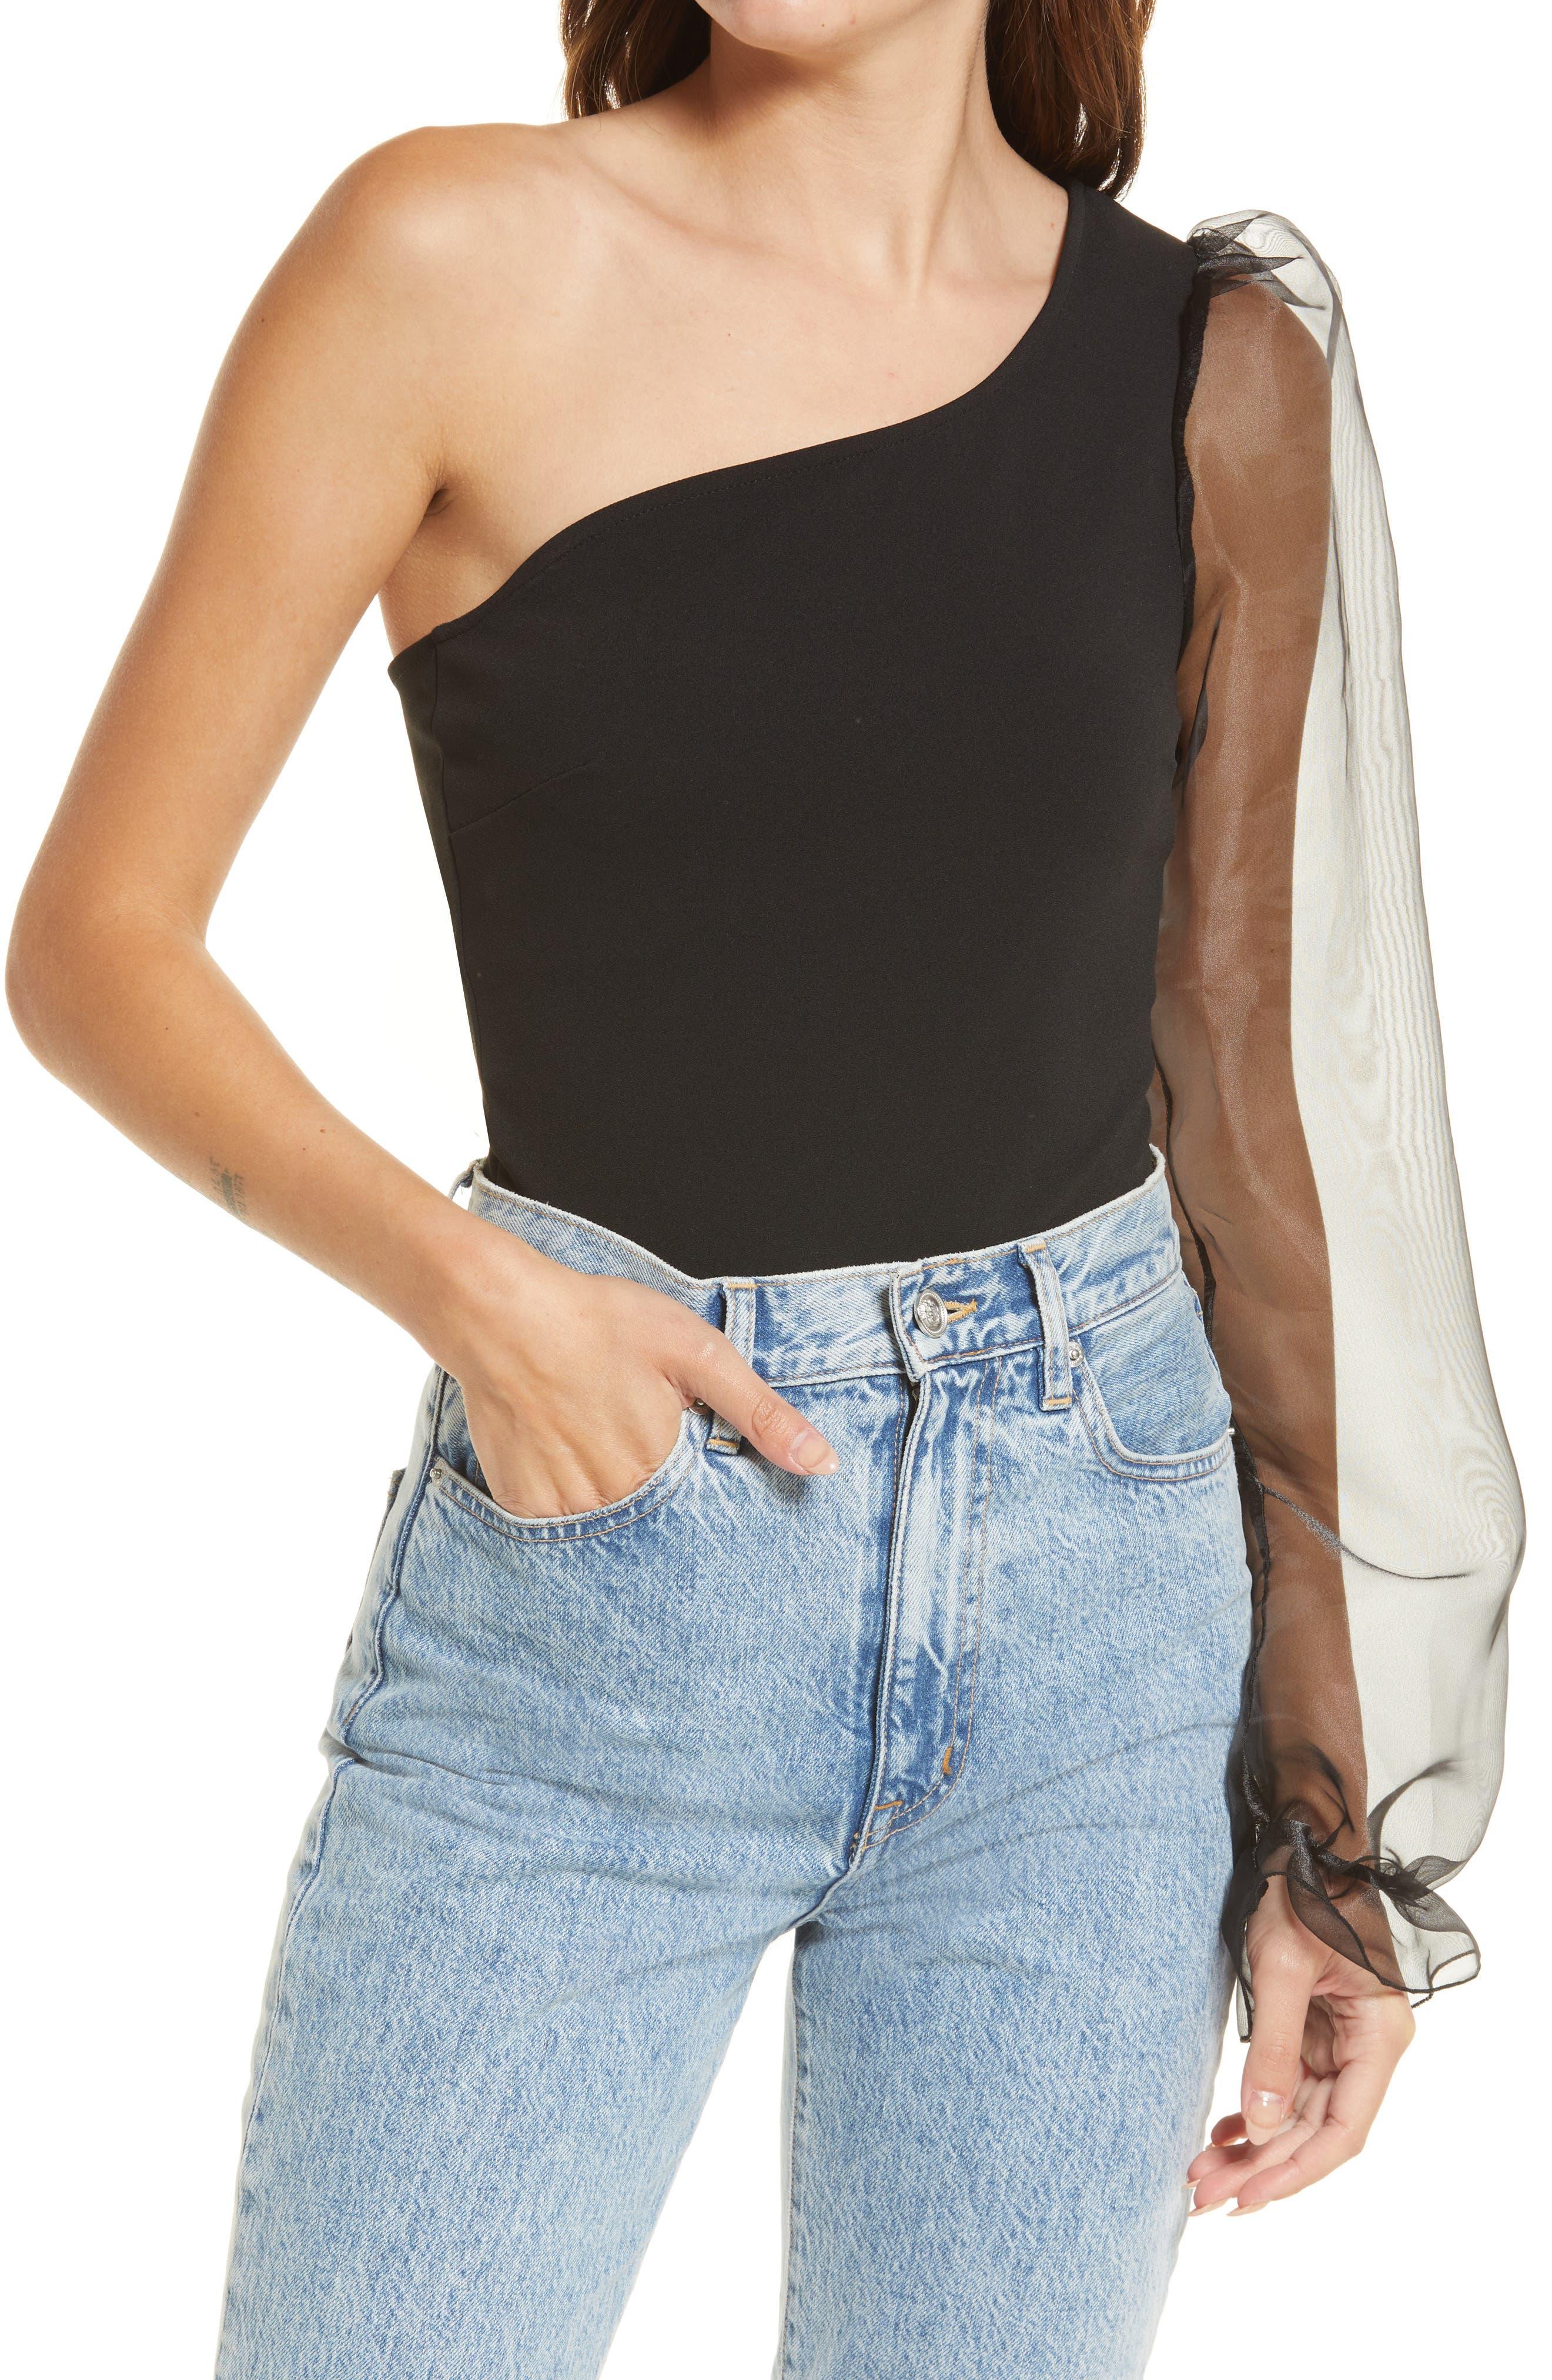 Mystique One-Shoulder Bodysuit